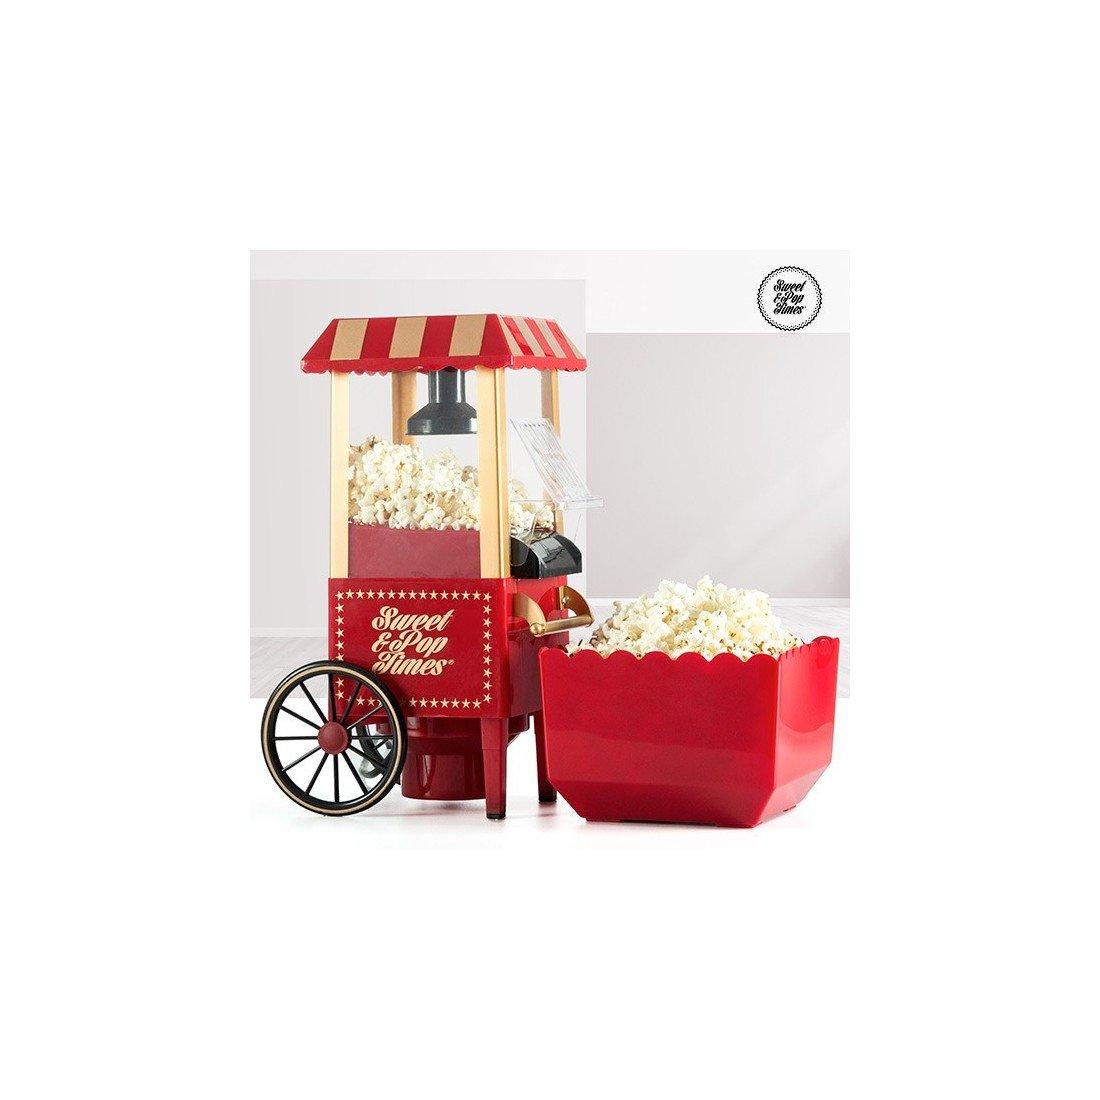 Appetitissime Sweet & Pop B1565166 - Macchina Popcorn, Carretto Vintage, 1200 W, colore rosso [Classe di efficienza energetica A] IGS